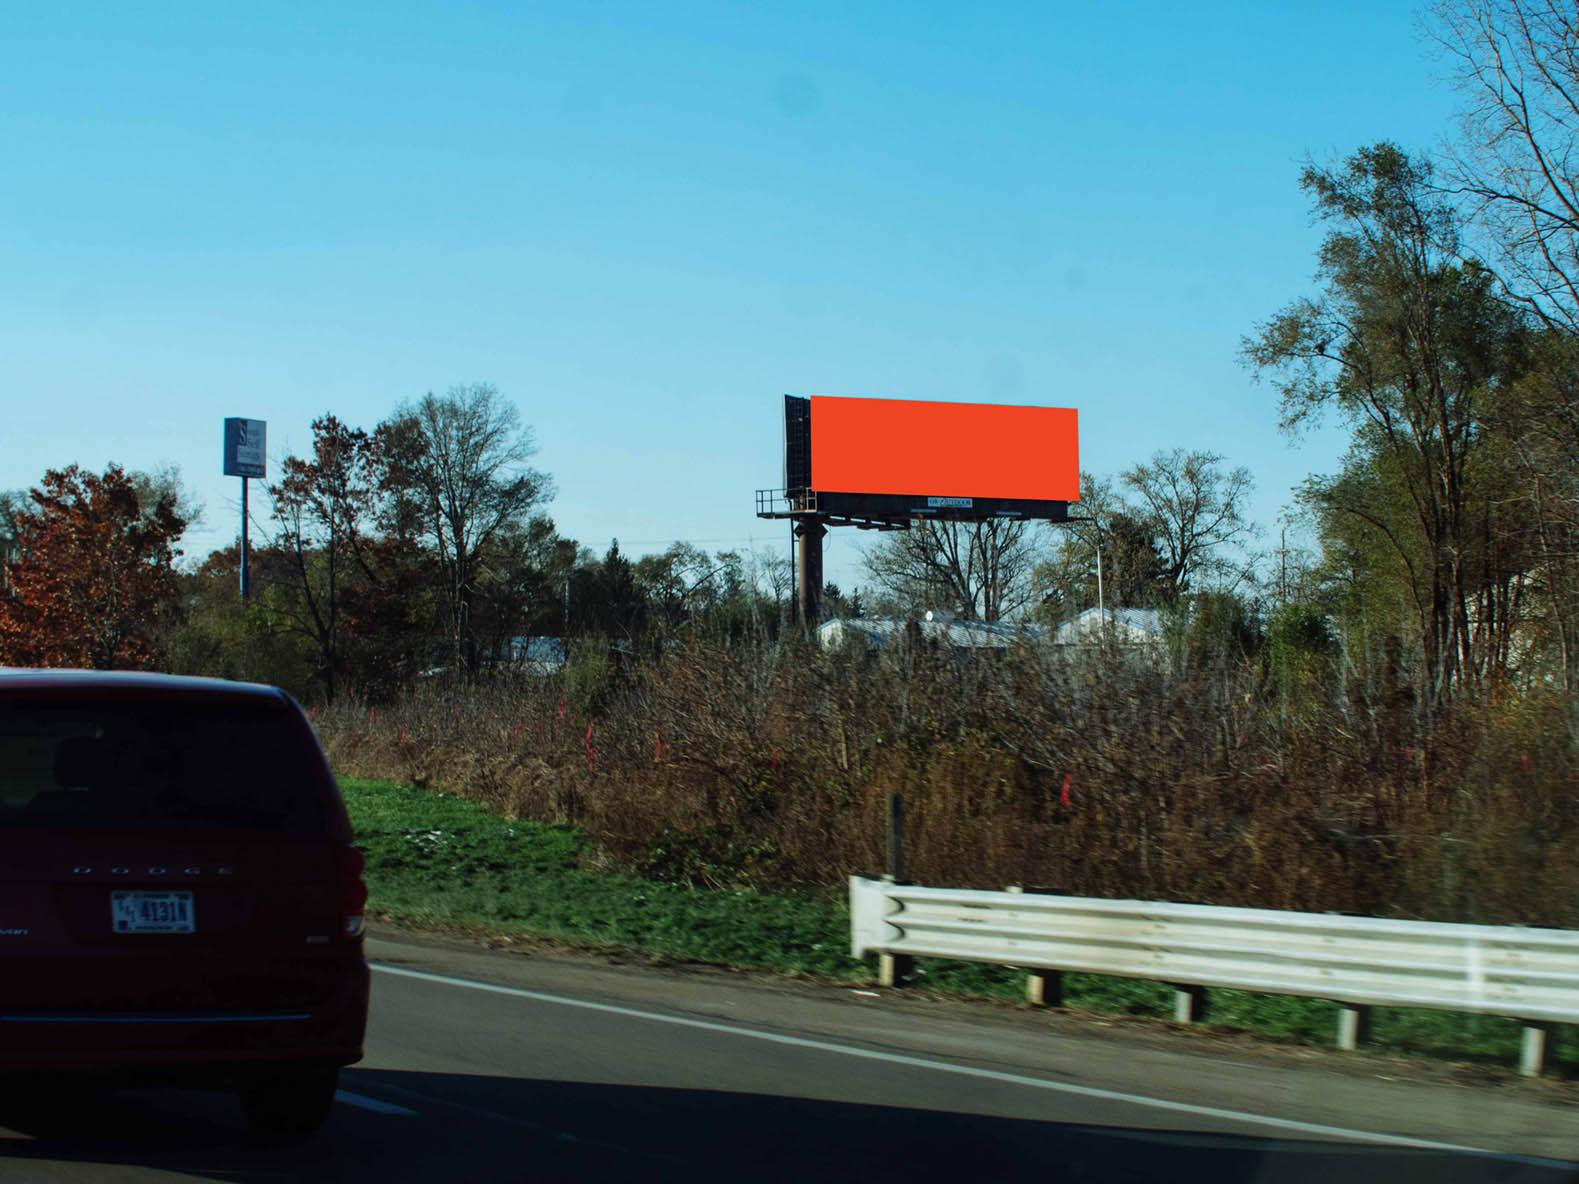 Billboard 114 North (14 x 48) - Geopath: 30745433